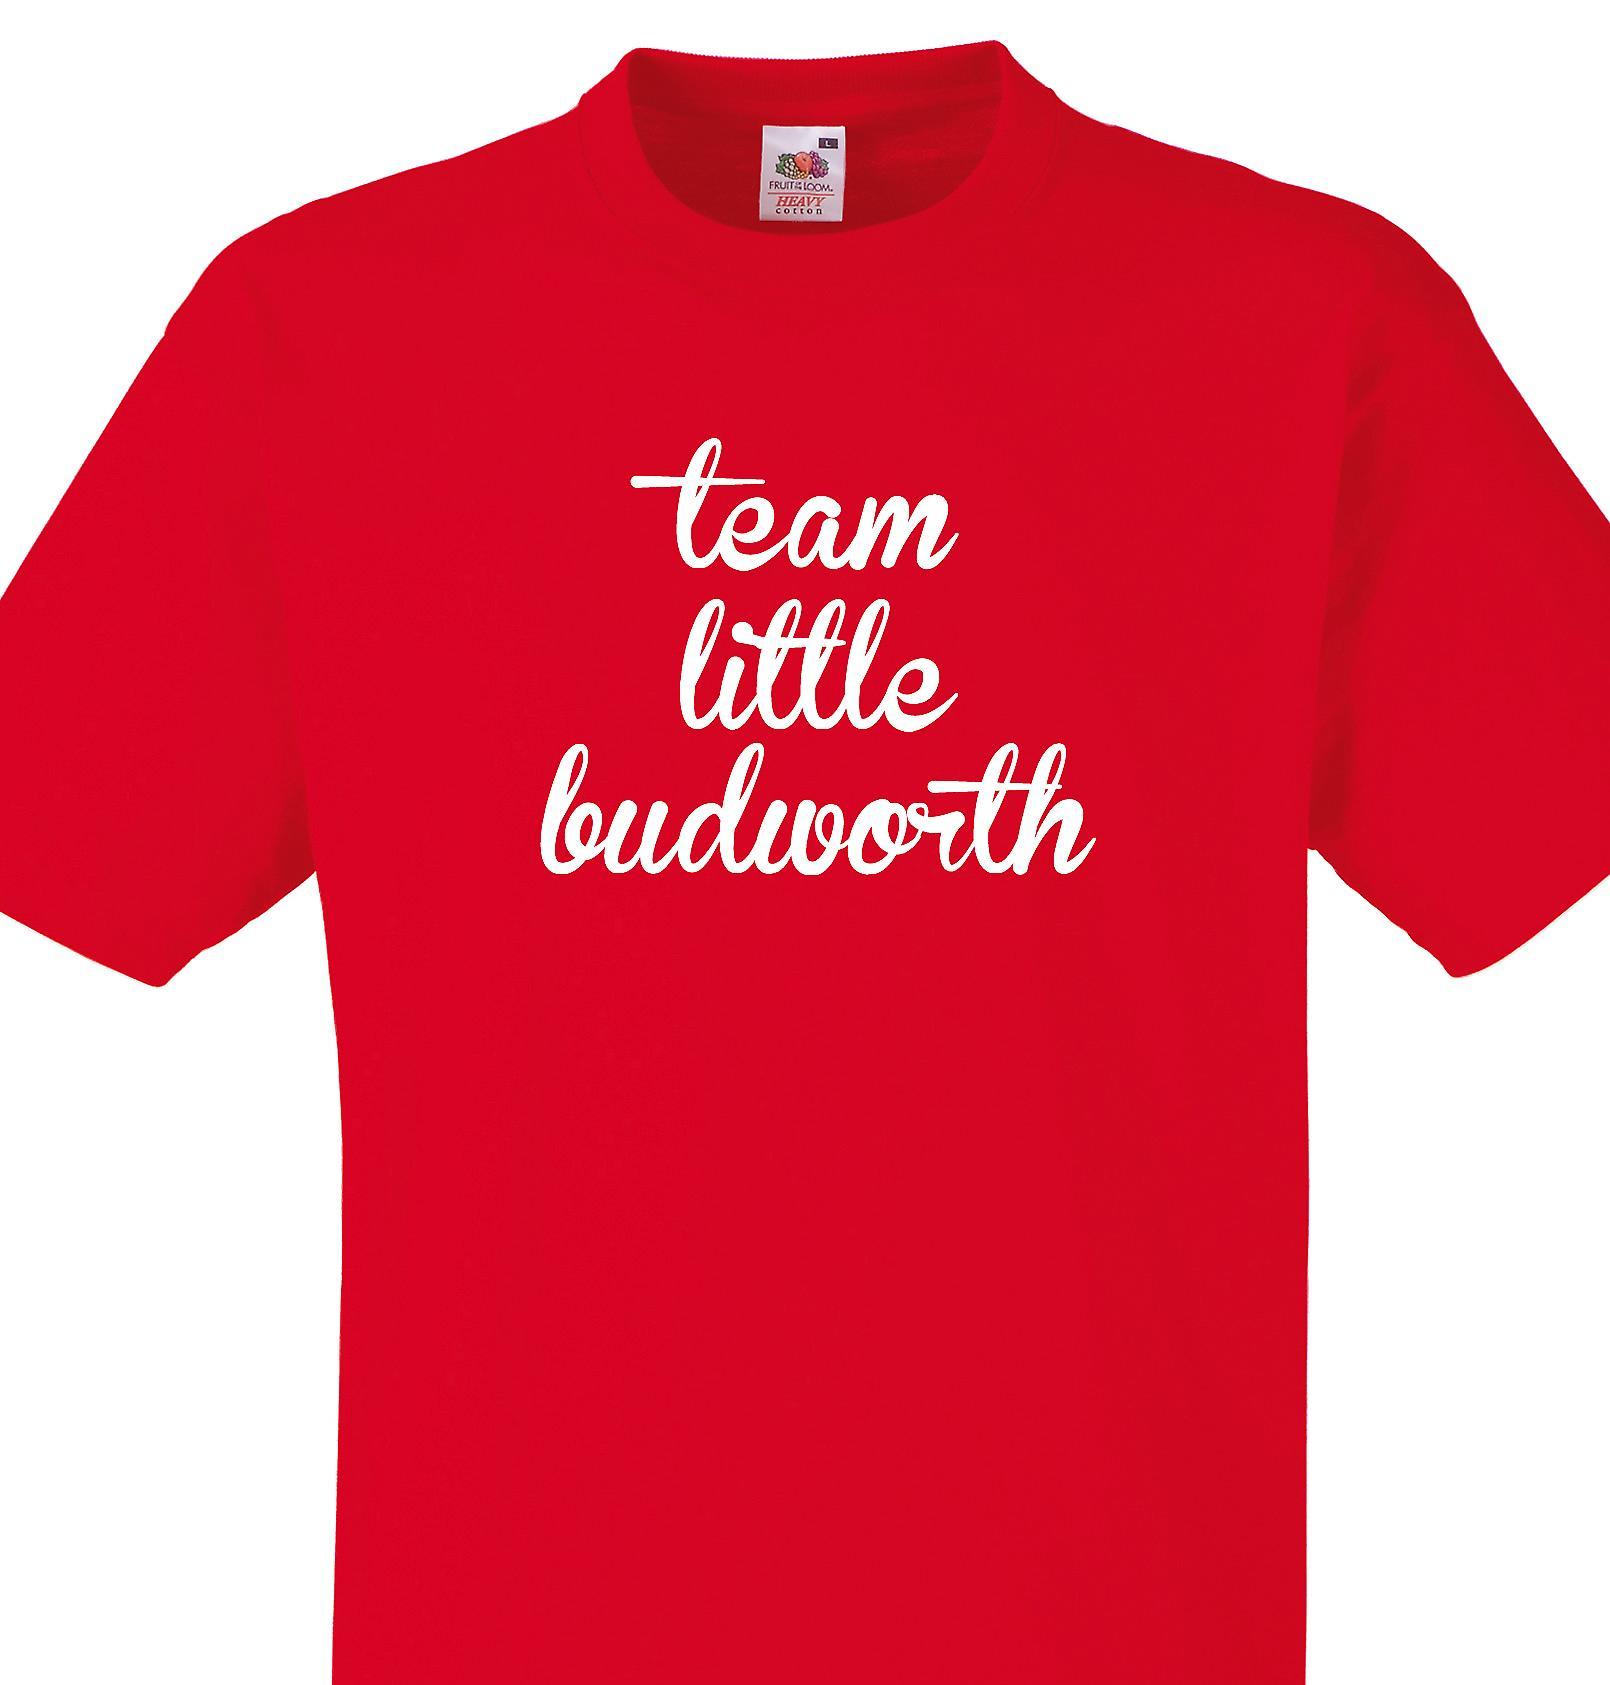 Team Little budworth Red T shirt